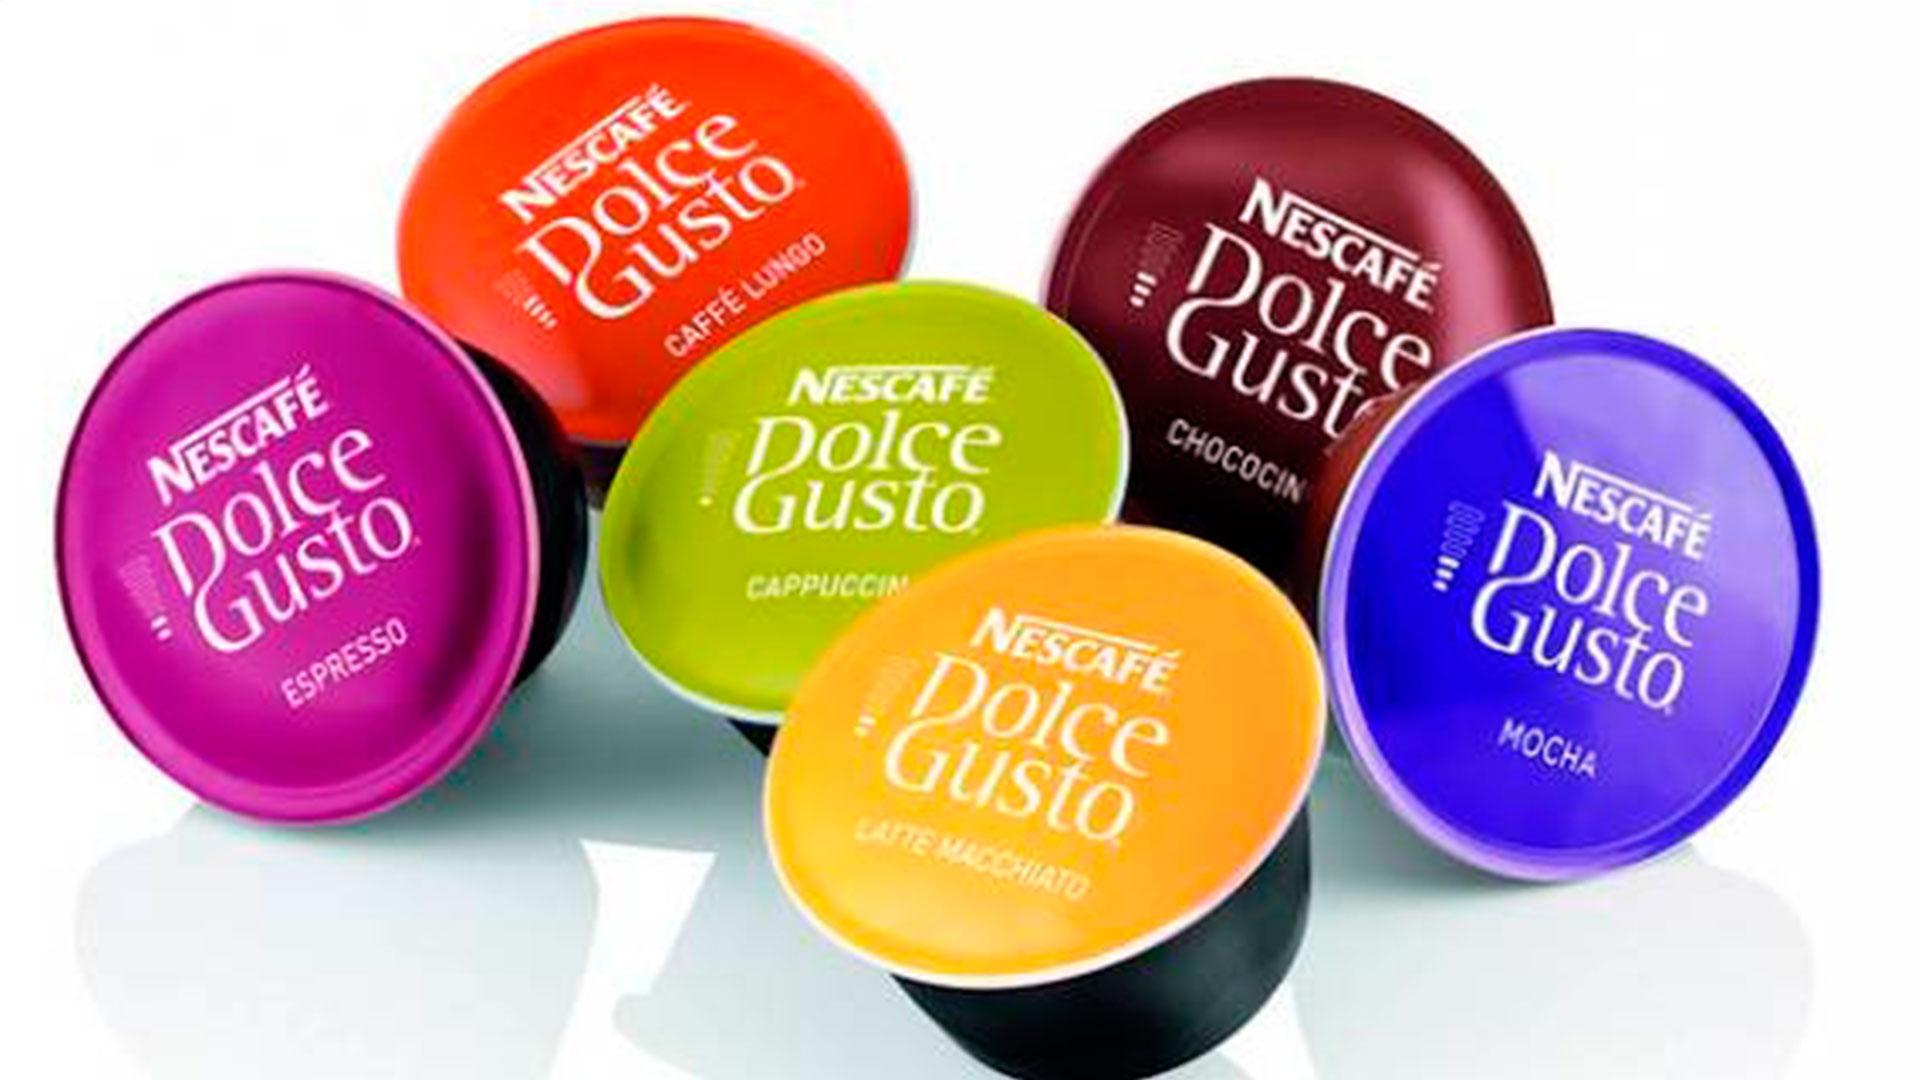 C psulas dolce gusto baratas ch ndal con tacones for Capsulas dolce gusto baratas